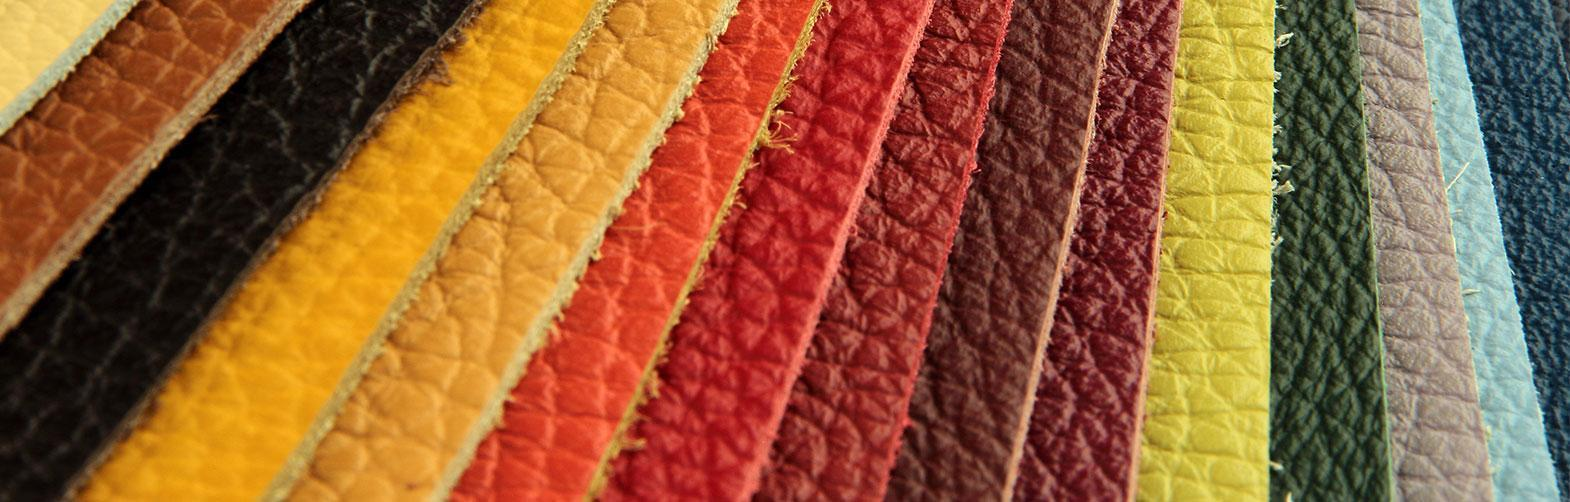 textiel-leder2_1_0_2.jpg